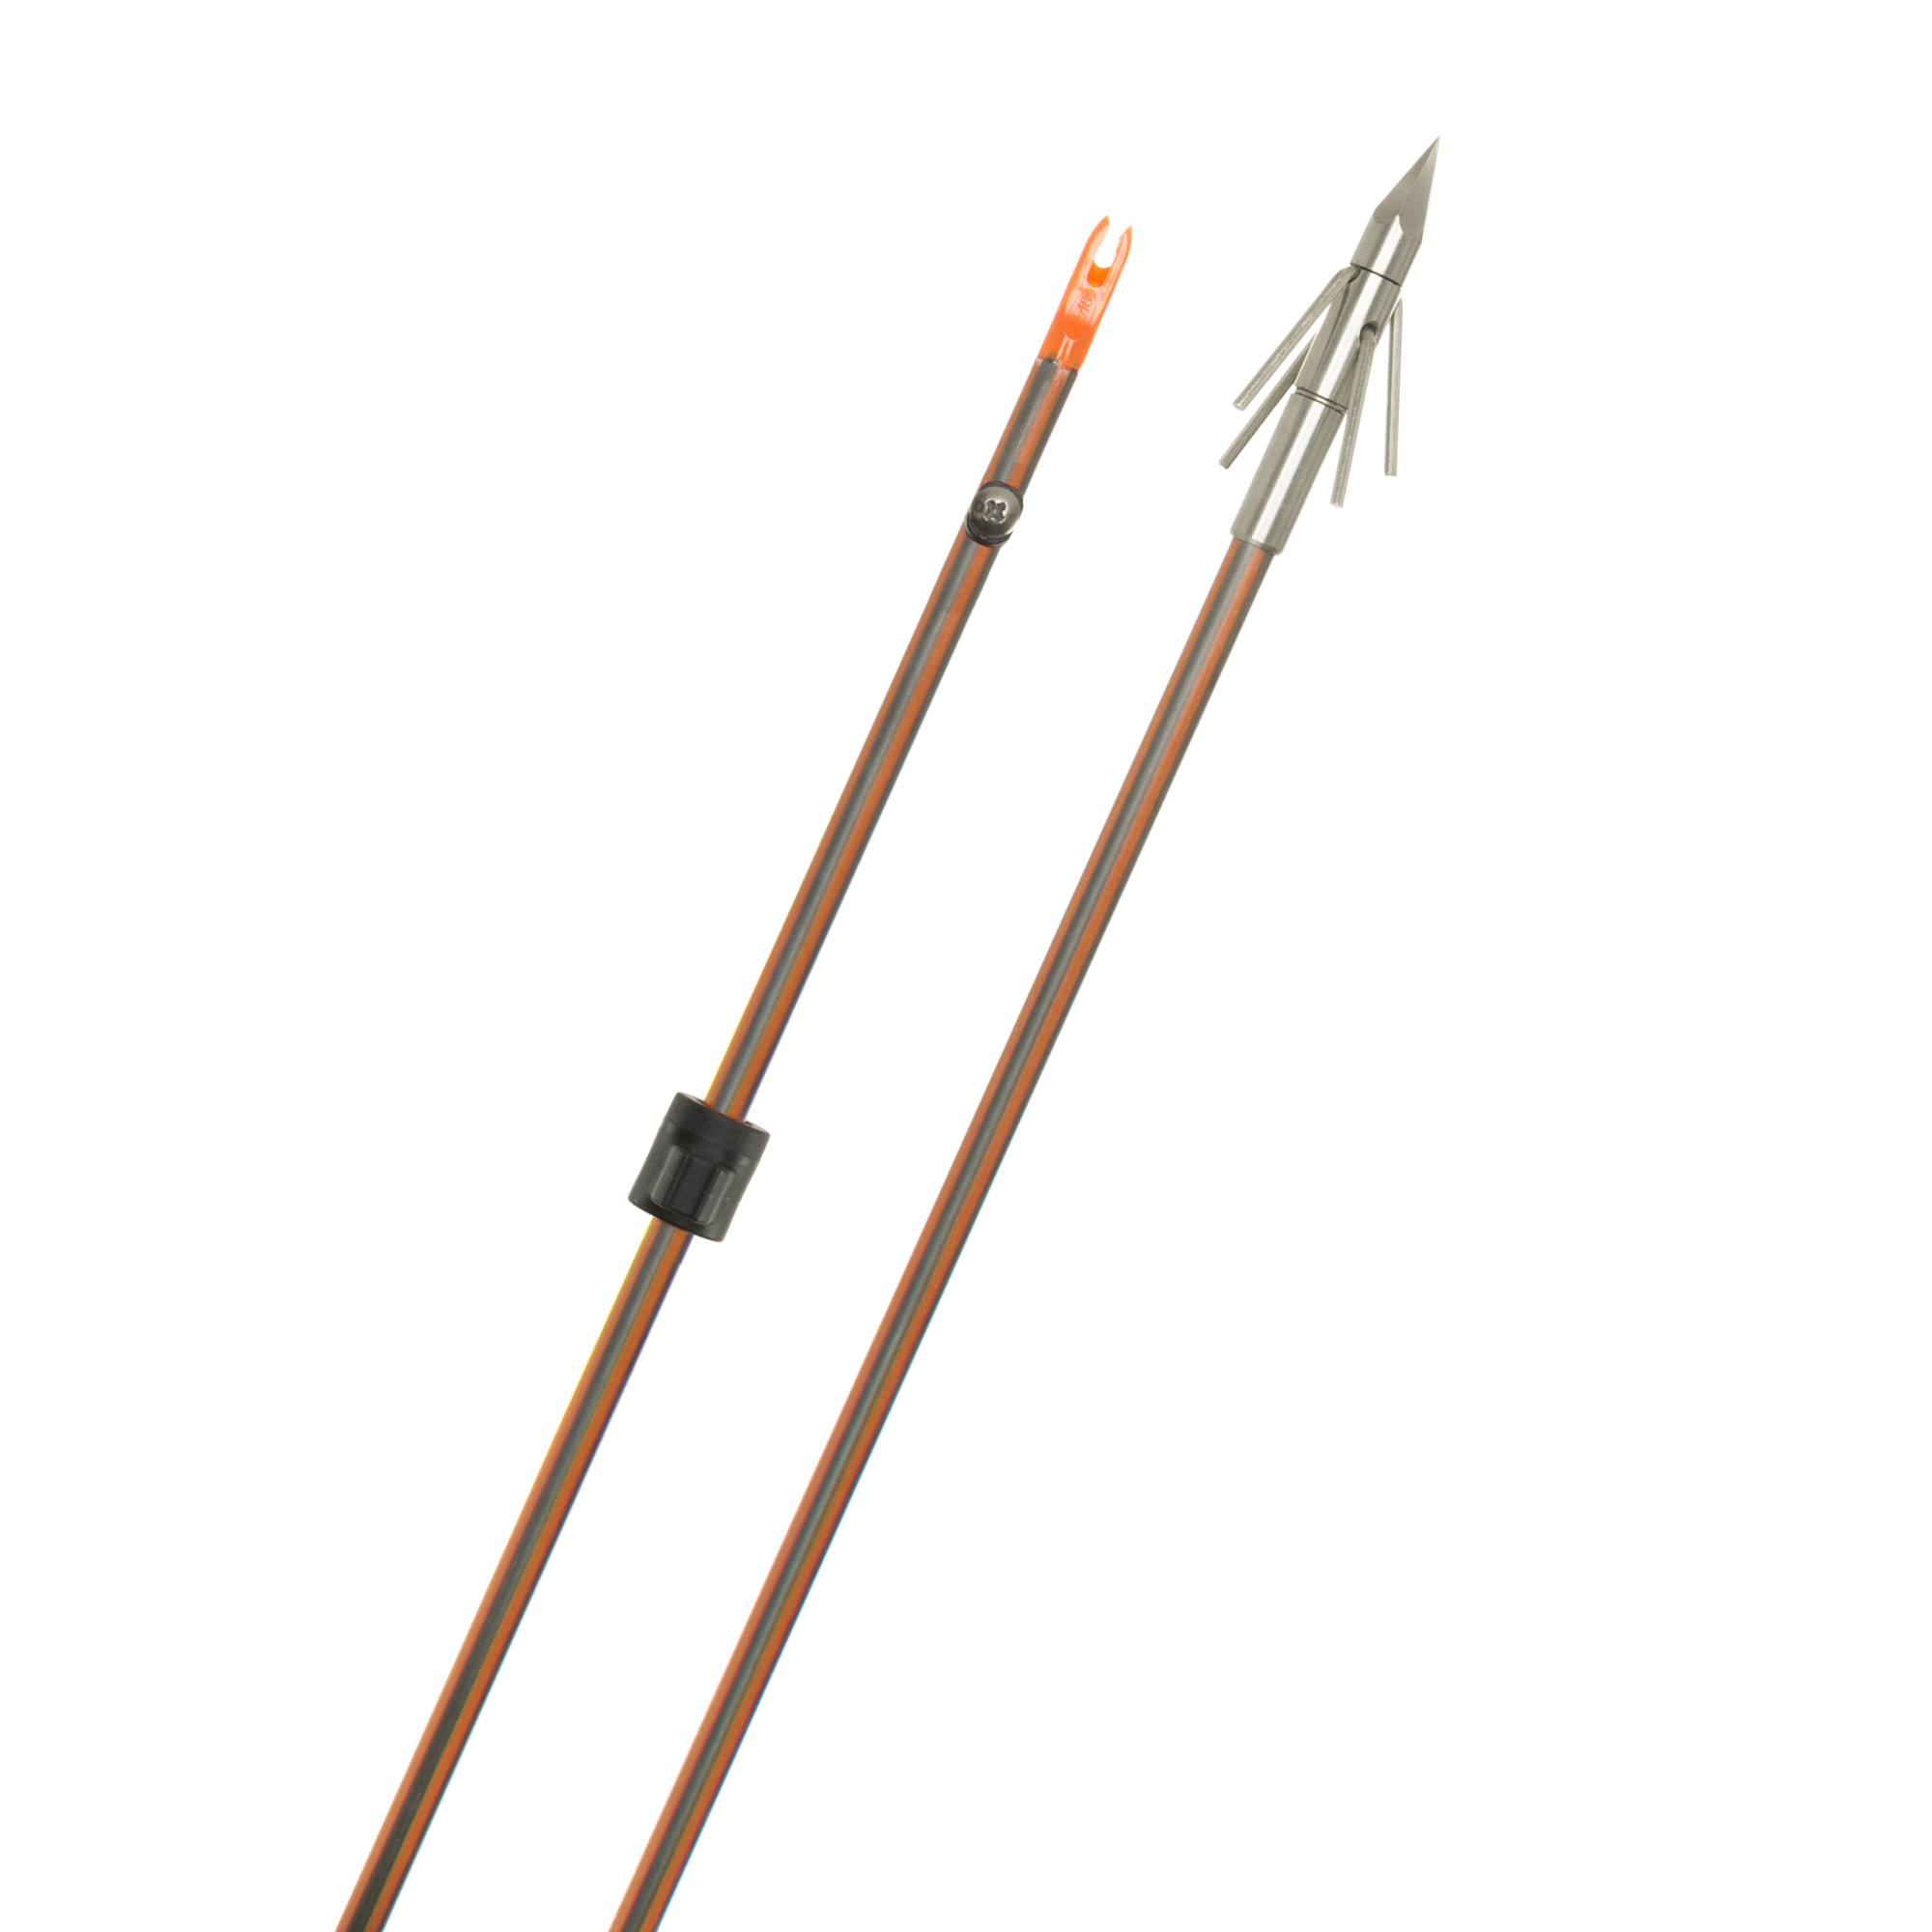 Hydro-Carbon IL Arrow w/Big Head Xtreme Point